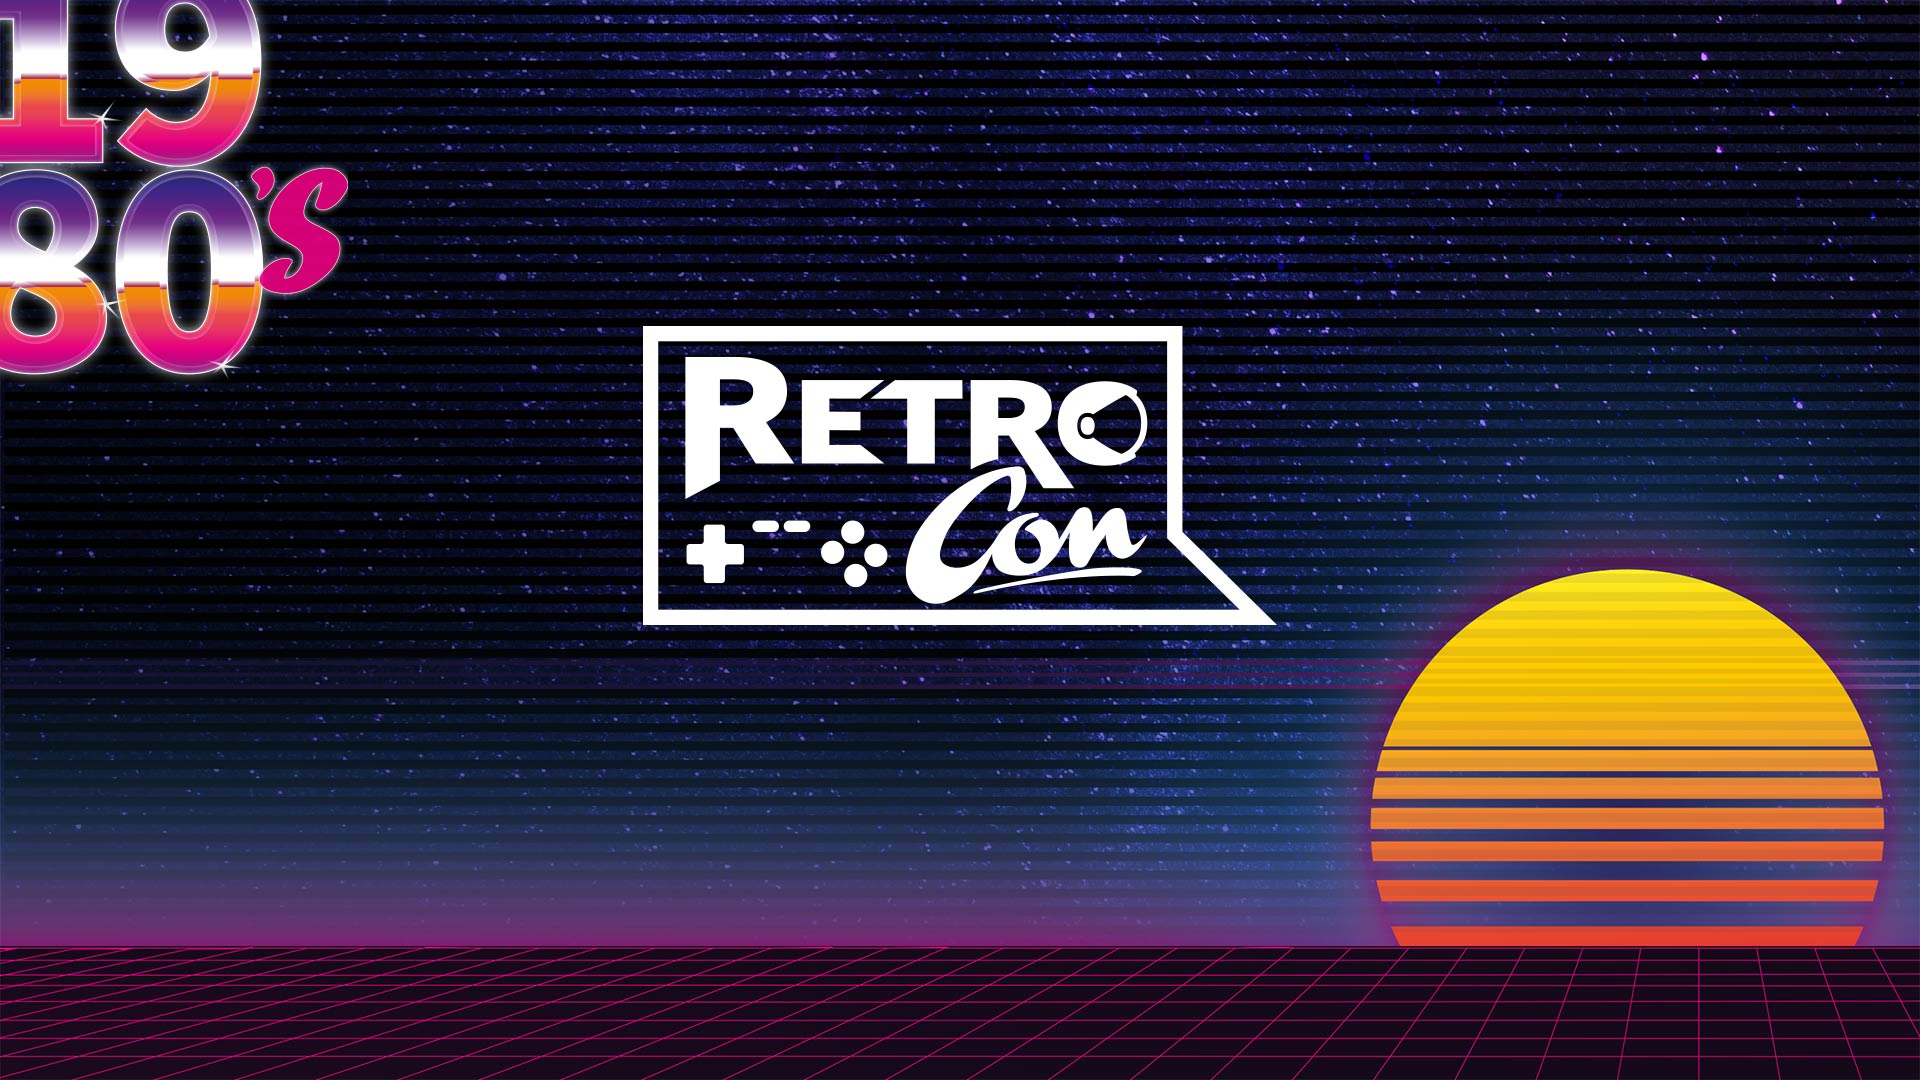 Retrocon logo